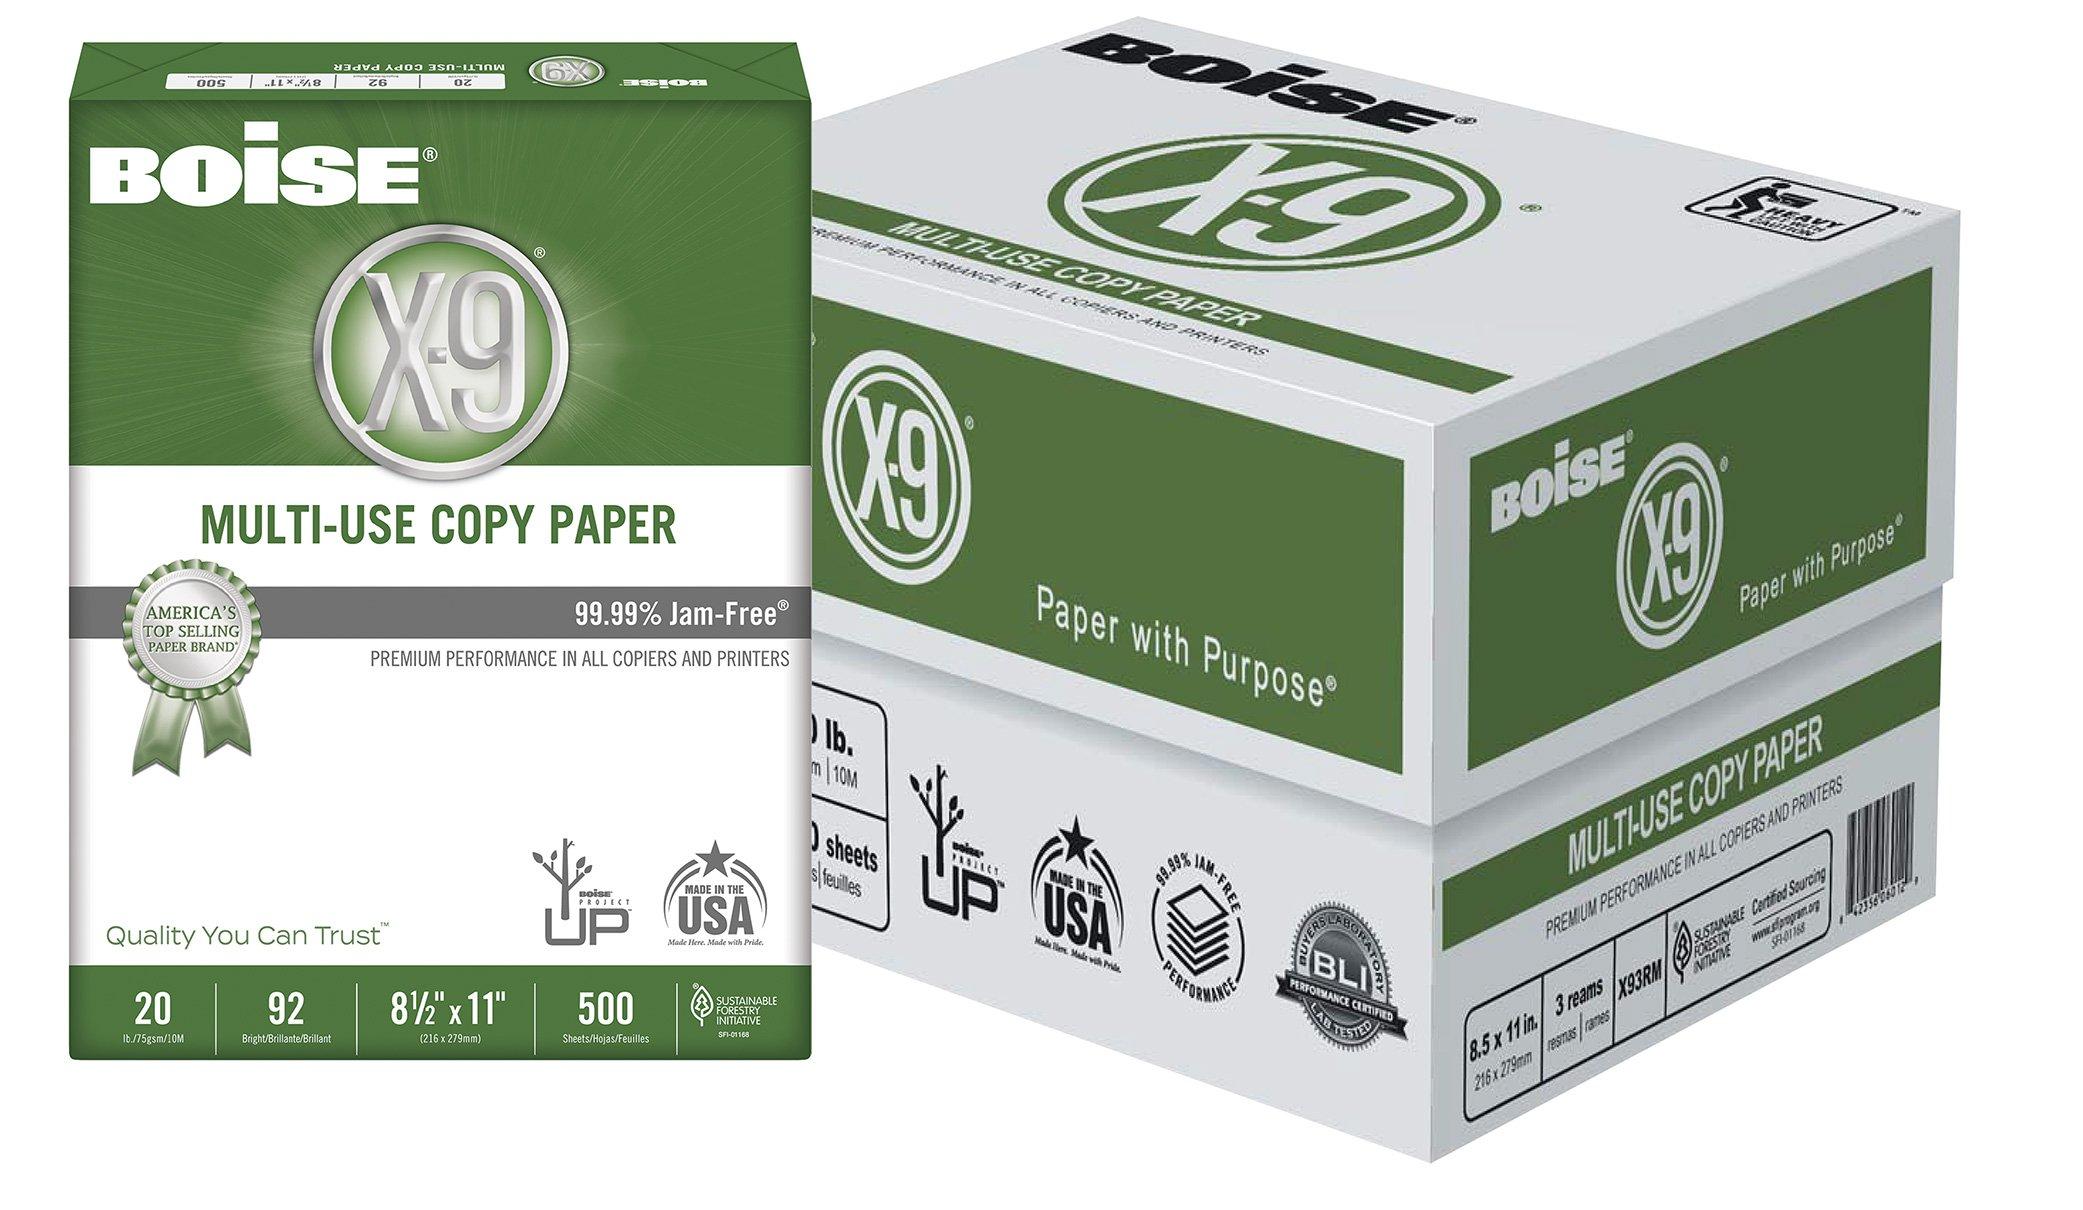 BOISE X-9 Multi-Use Copy Paper, 8.5 x 11, 92 Bright White, 20 lb, 3 ream carton (1,500 Sheets) by Boise Paper (Image #1)